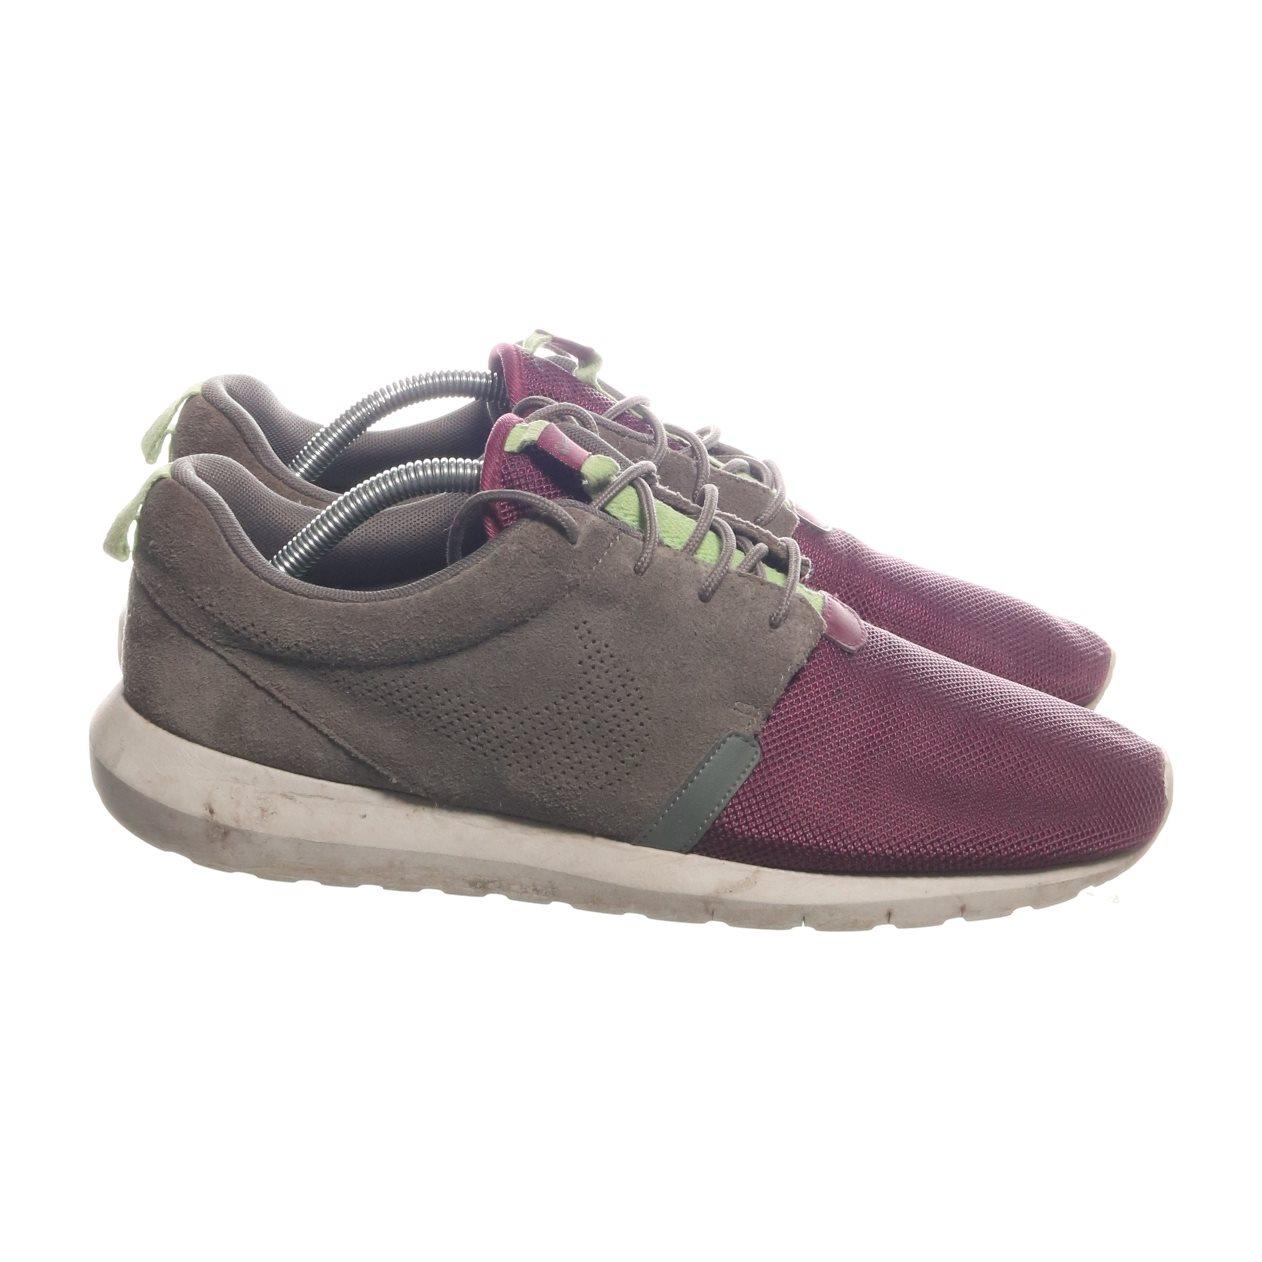 reputable site 9940b 41683 Nike, Sneakers, Strl  44.5, Rosherun NM FB, Grön Lila